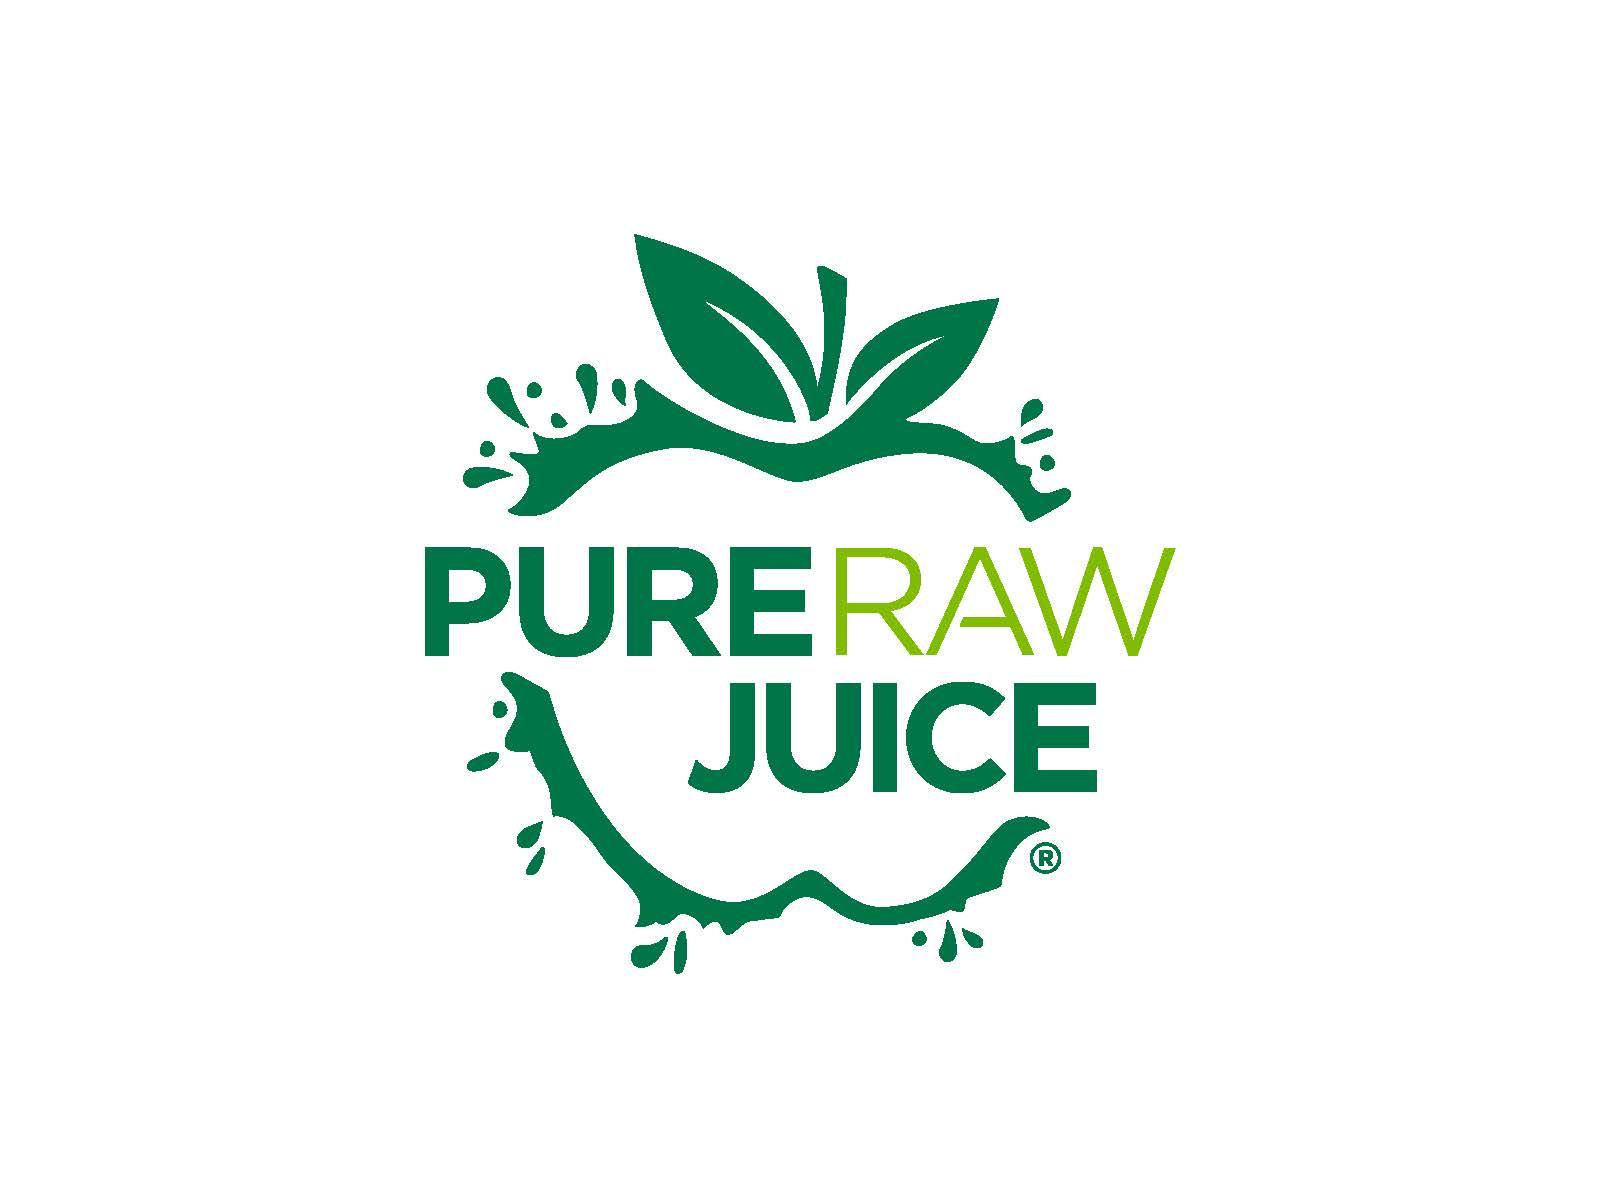 Pure raw juice logo